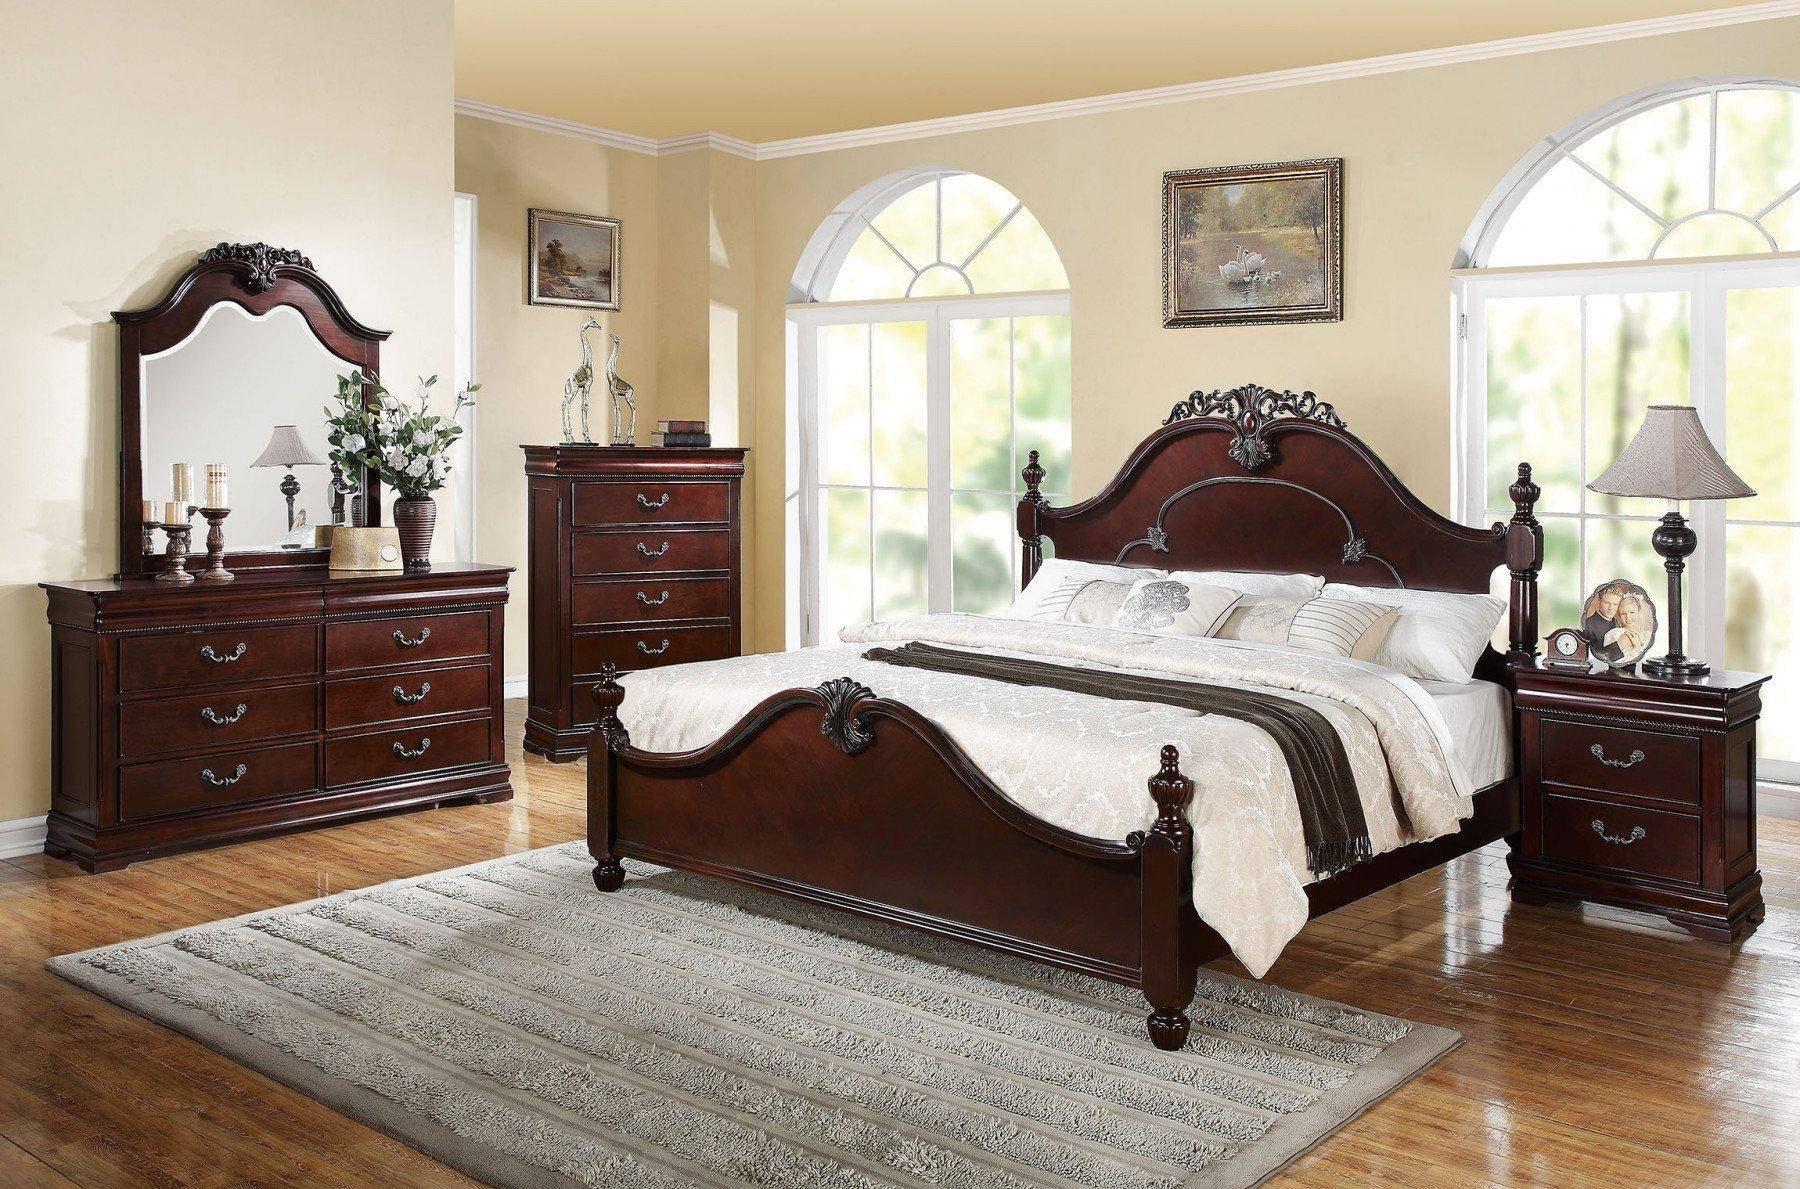 Grand Furniture Bedroom Set Fresh Cherry Poster King Bedroom Set 5 Pcs Acme Furniture Ek